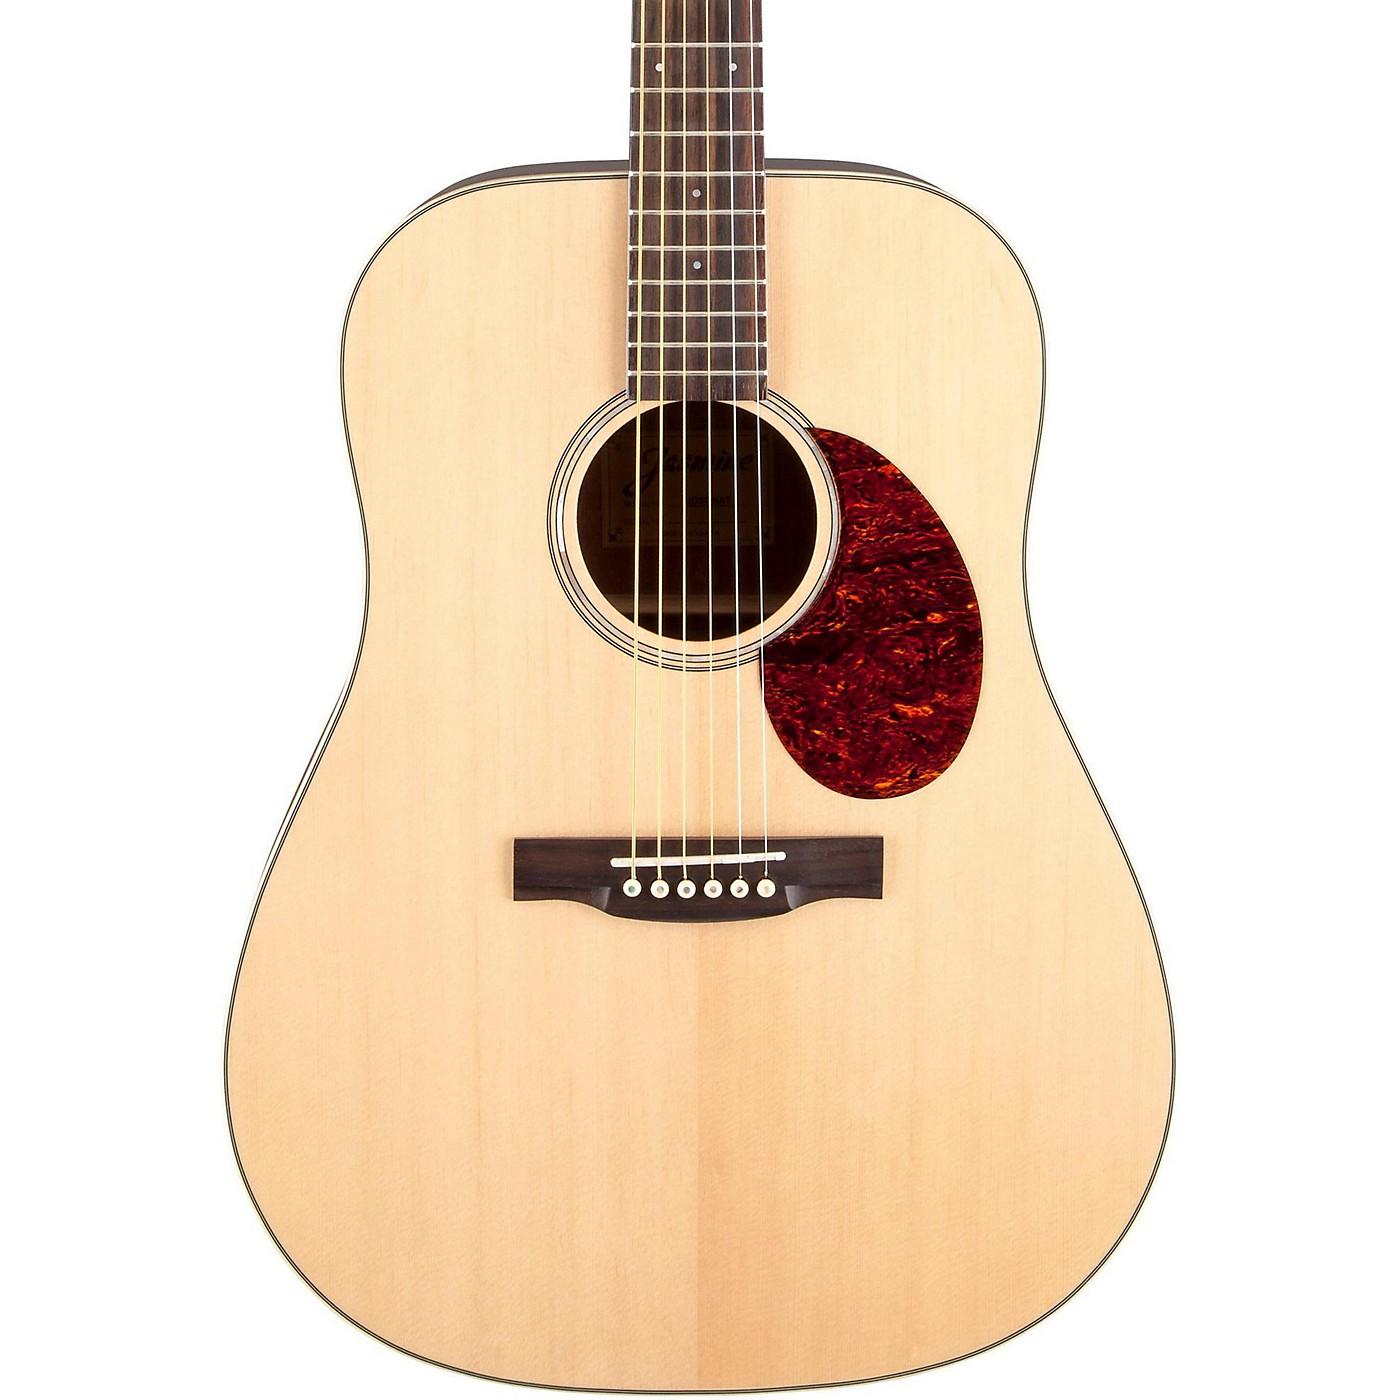 Jasmine JD-37 Solid Top Dreadnought Acoustic Guitar thumbnail